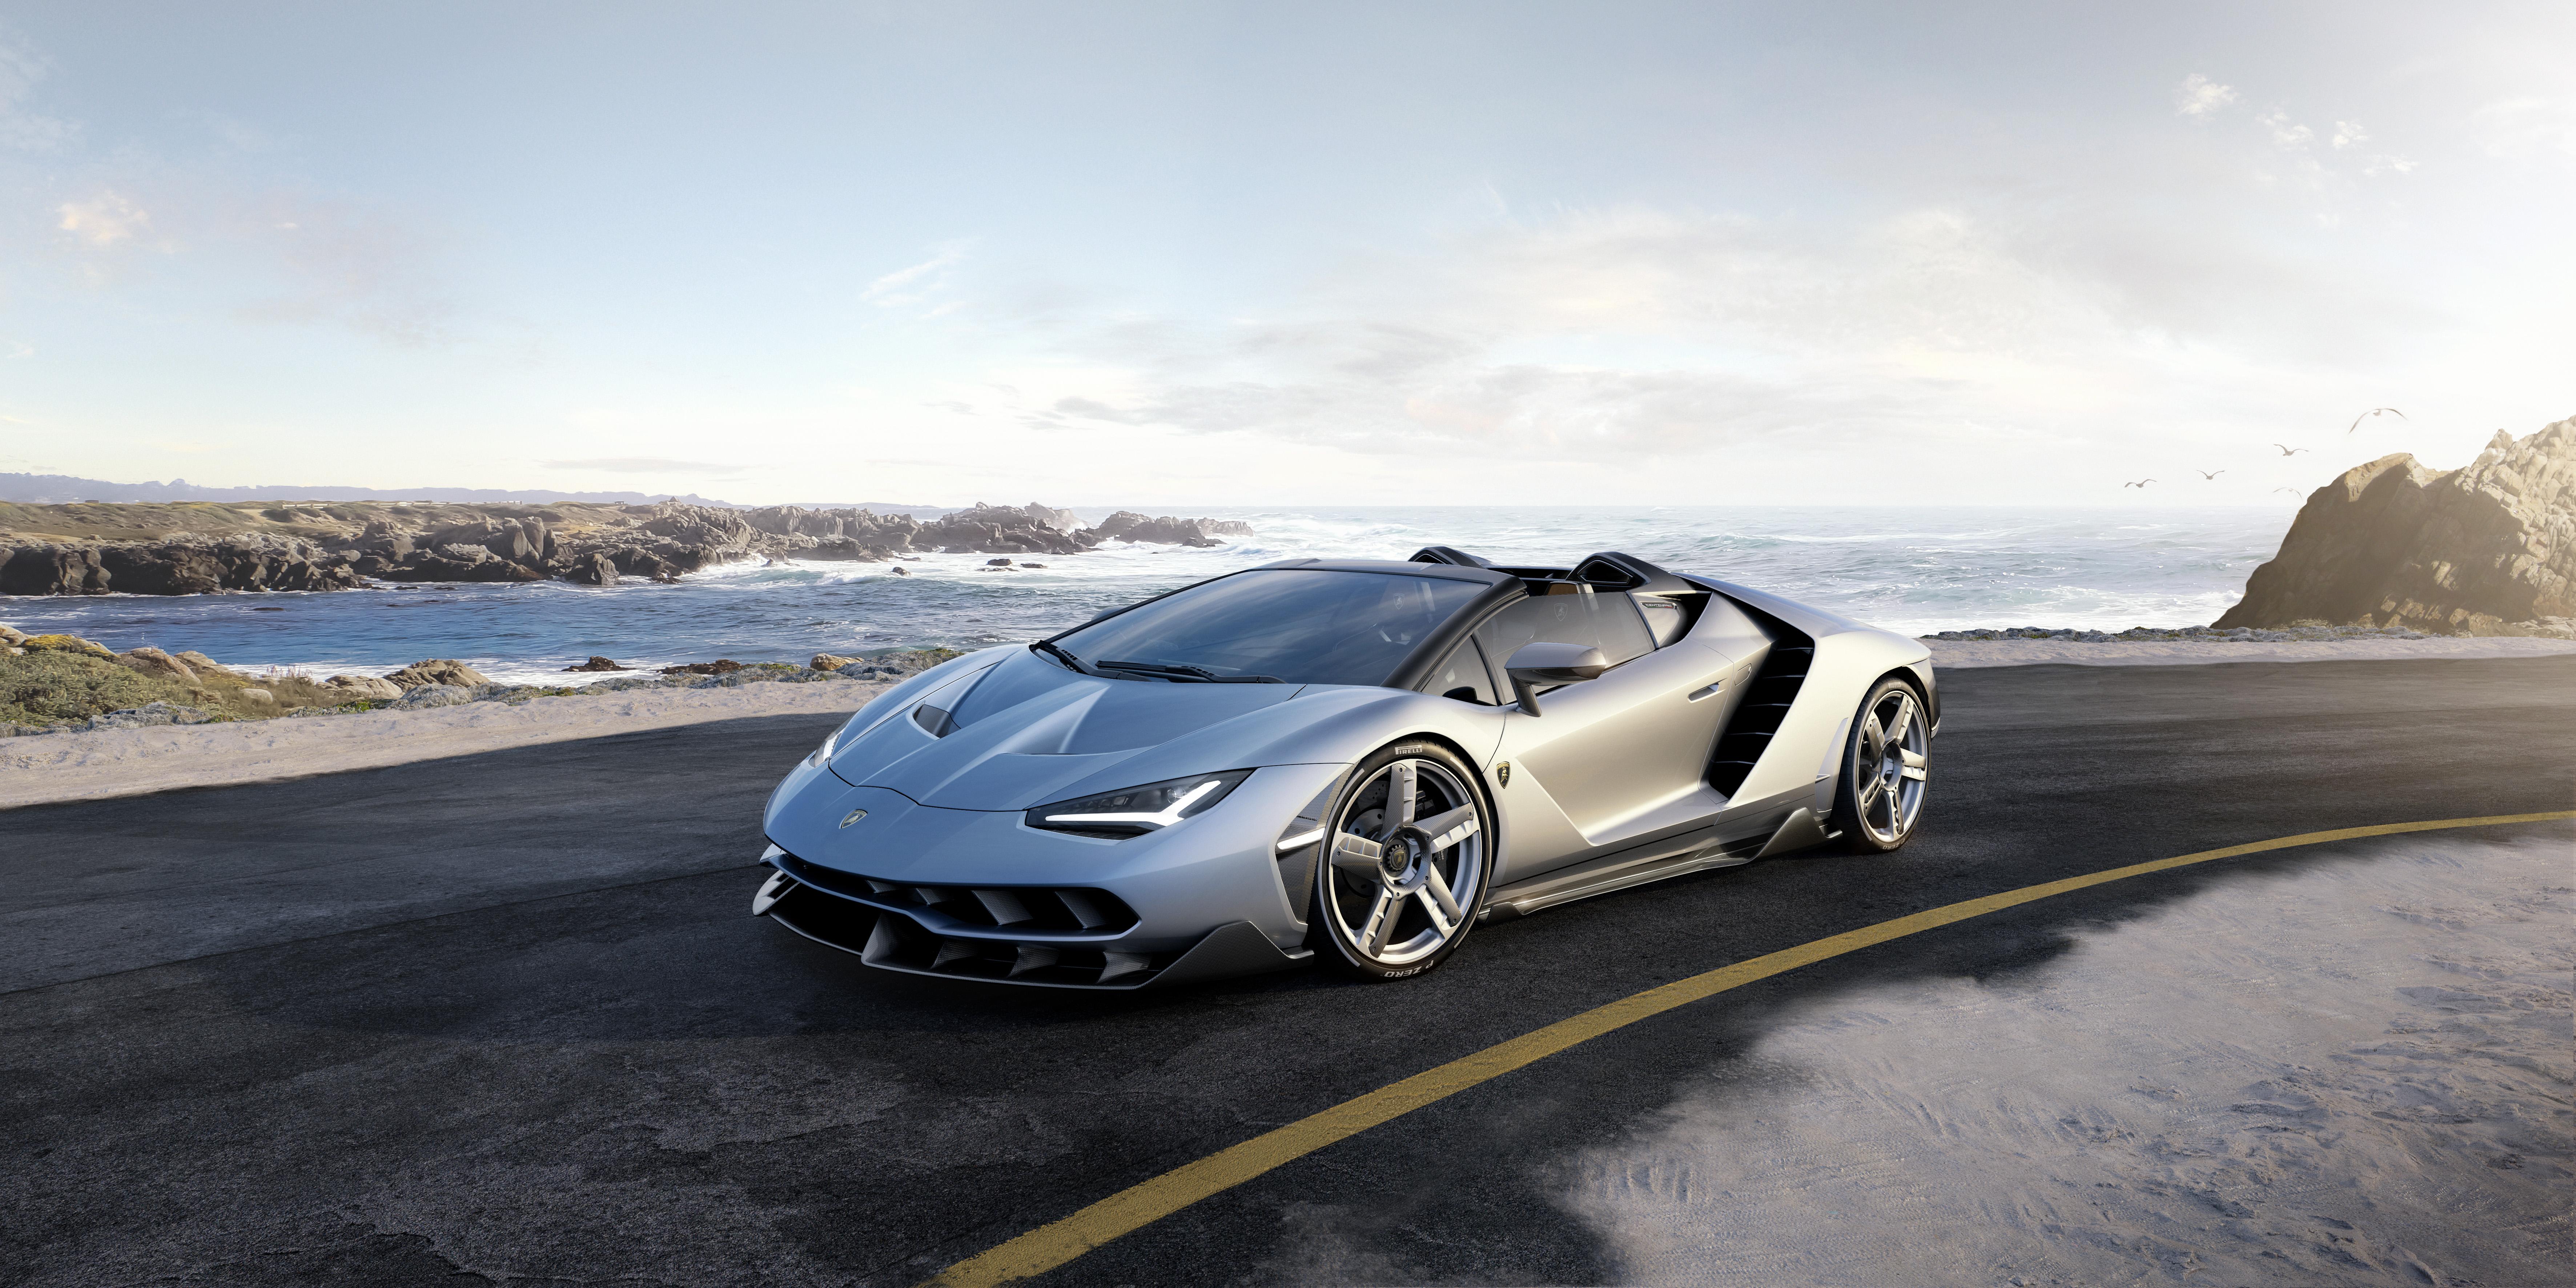 Lamborghini Centenario Roadster Gallery The Verge